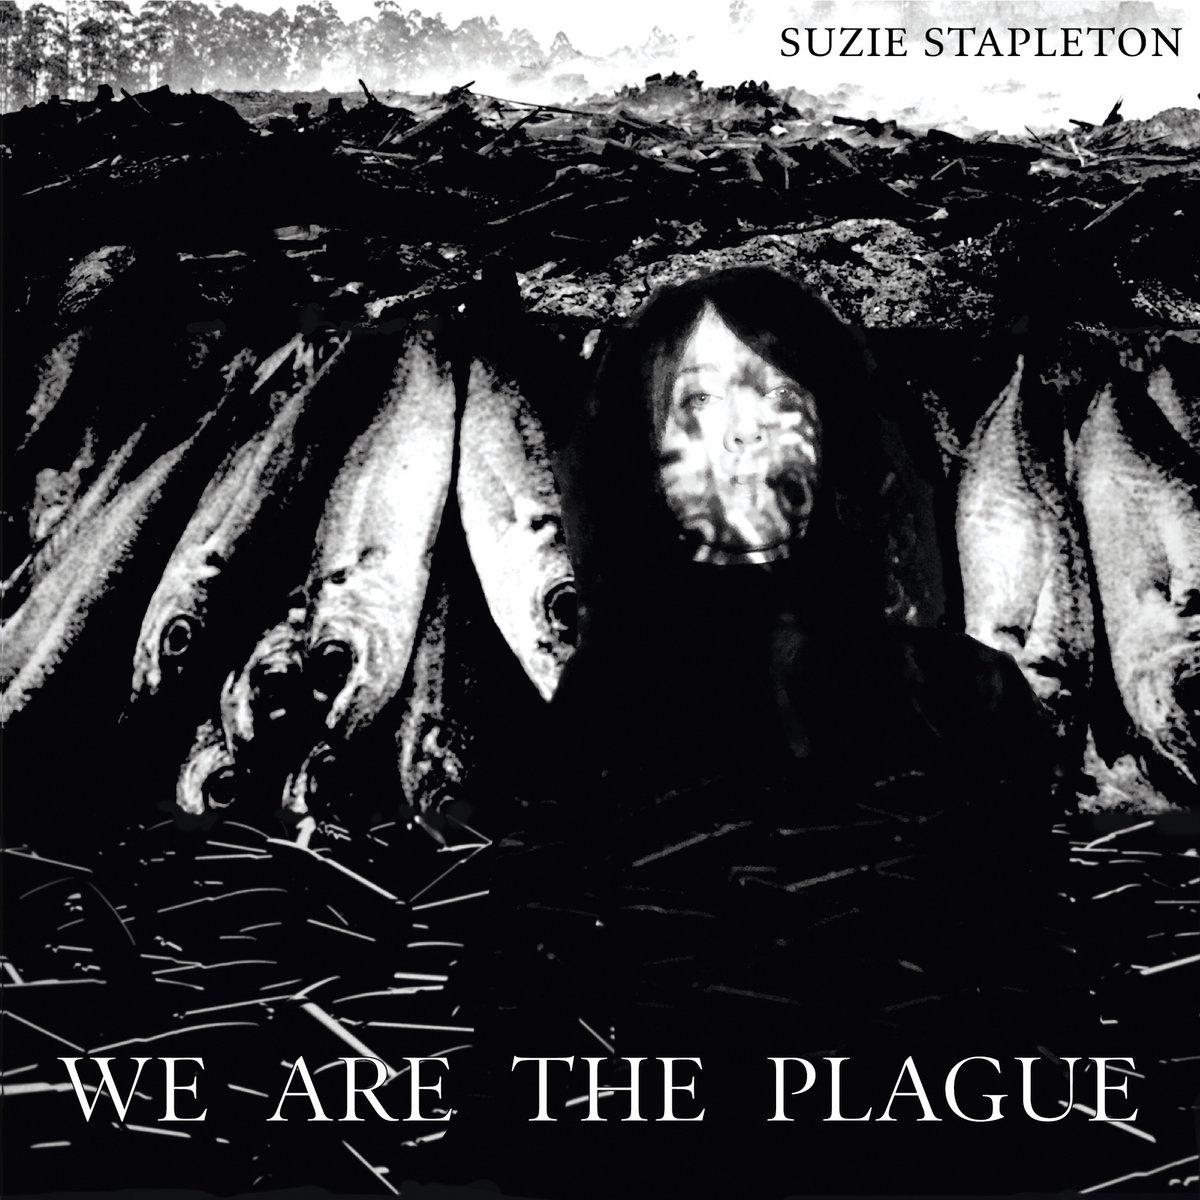 SUZIE STAPLETON (Dark Rock), We Are The Plague (2020)